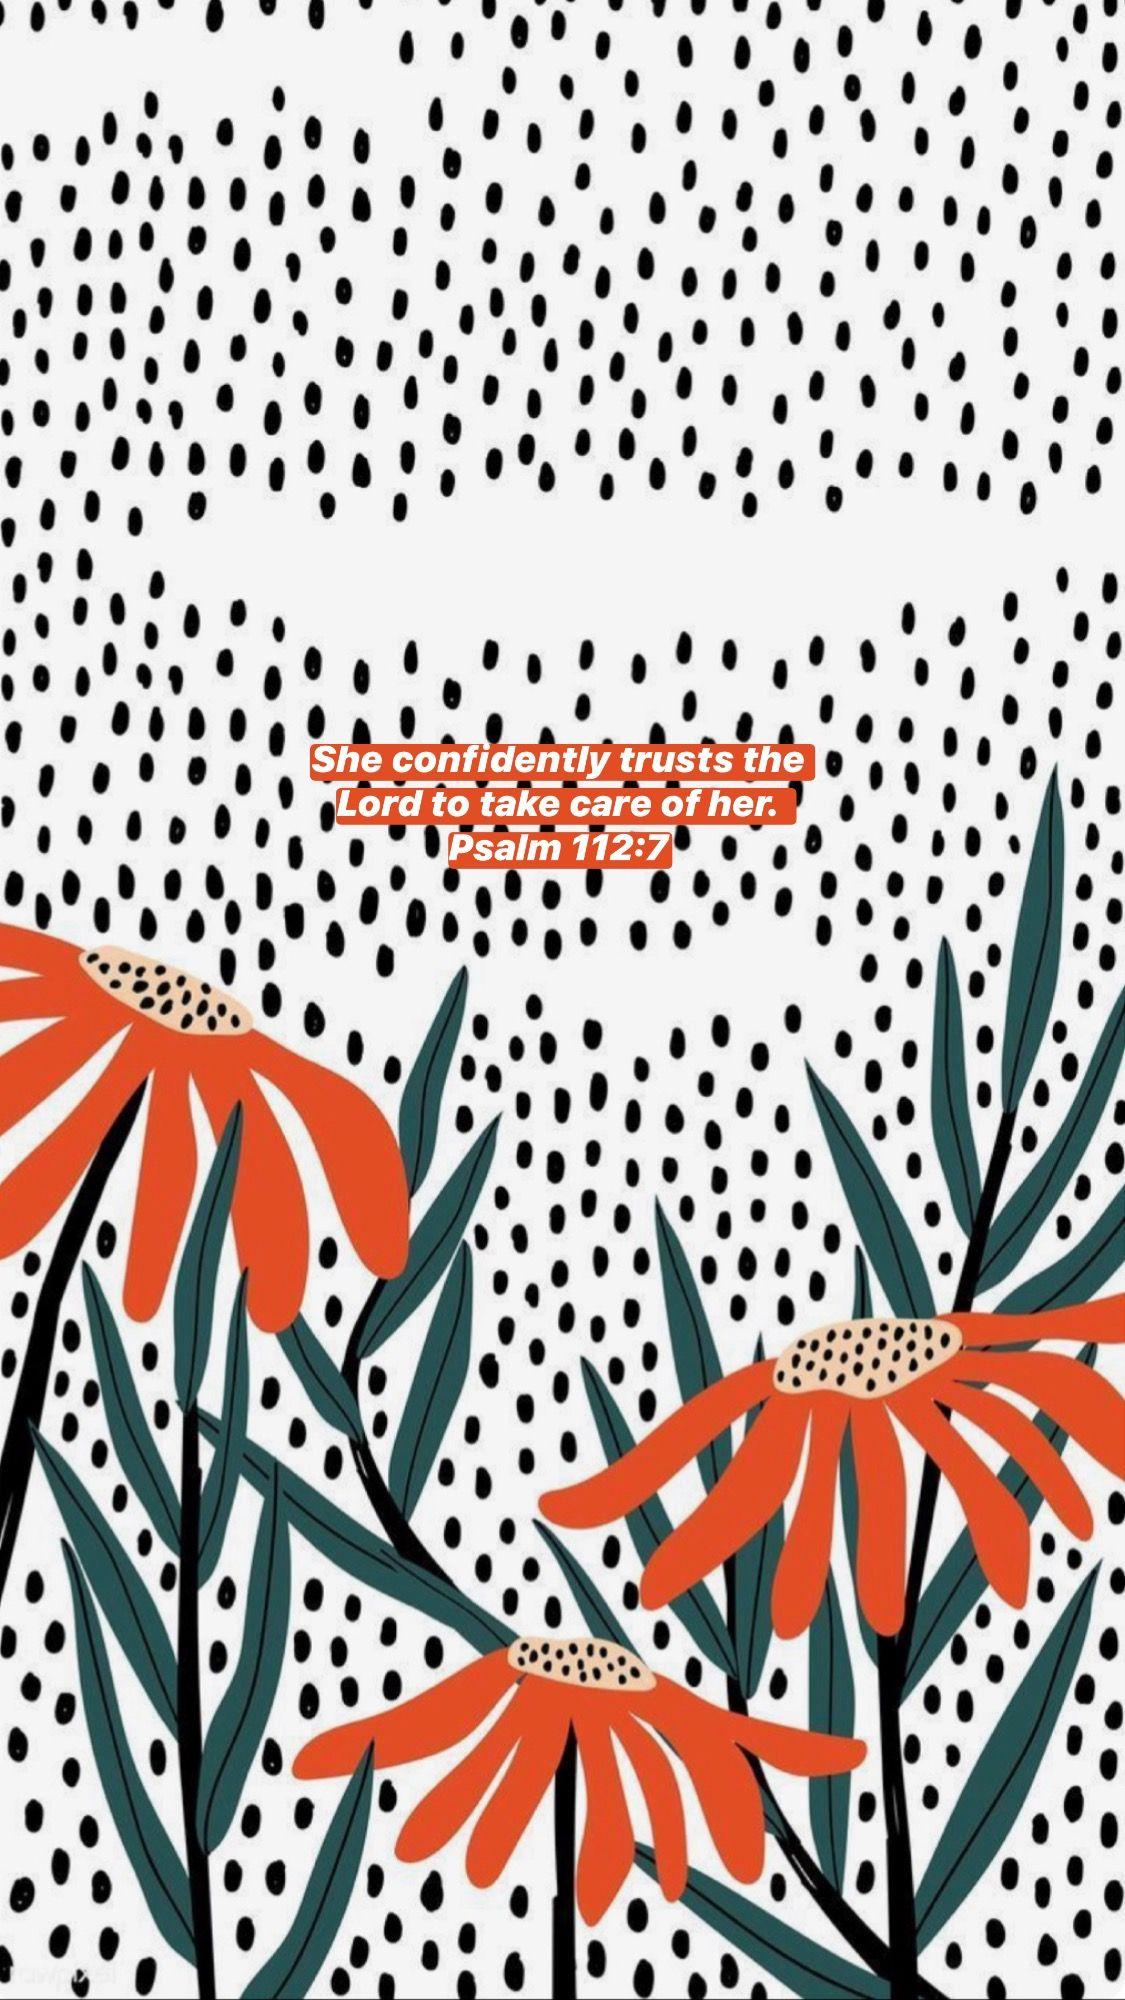 pin by megan ferguson on faith polka dot background